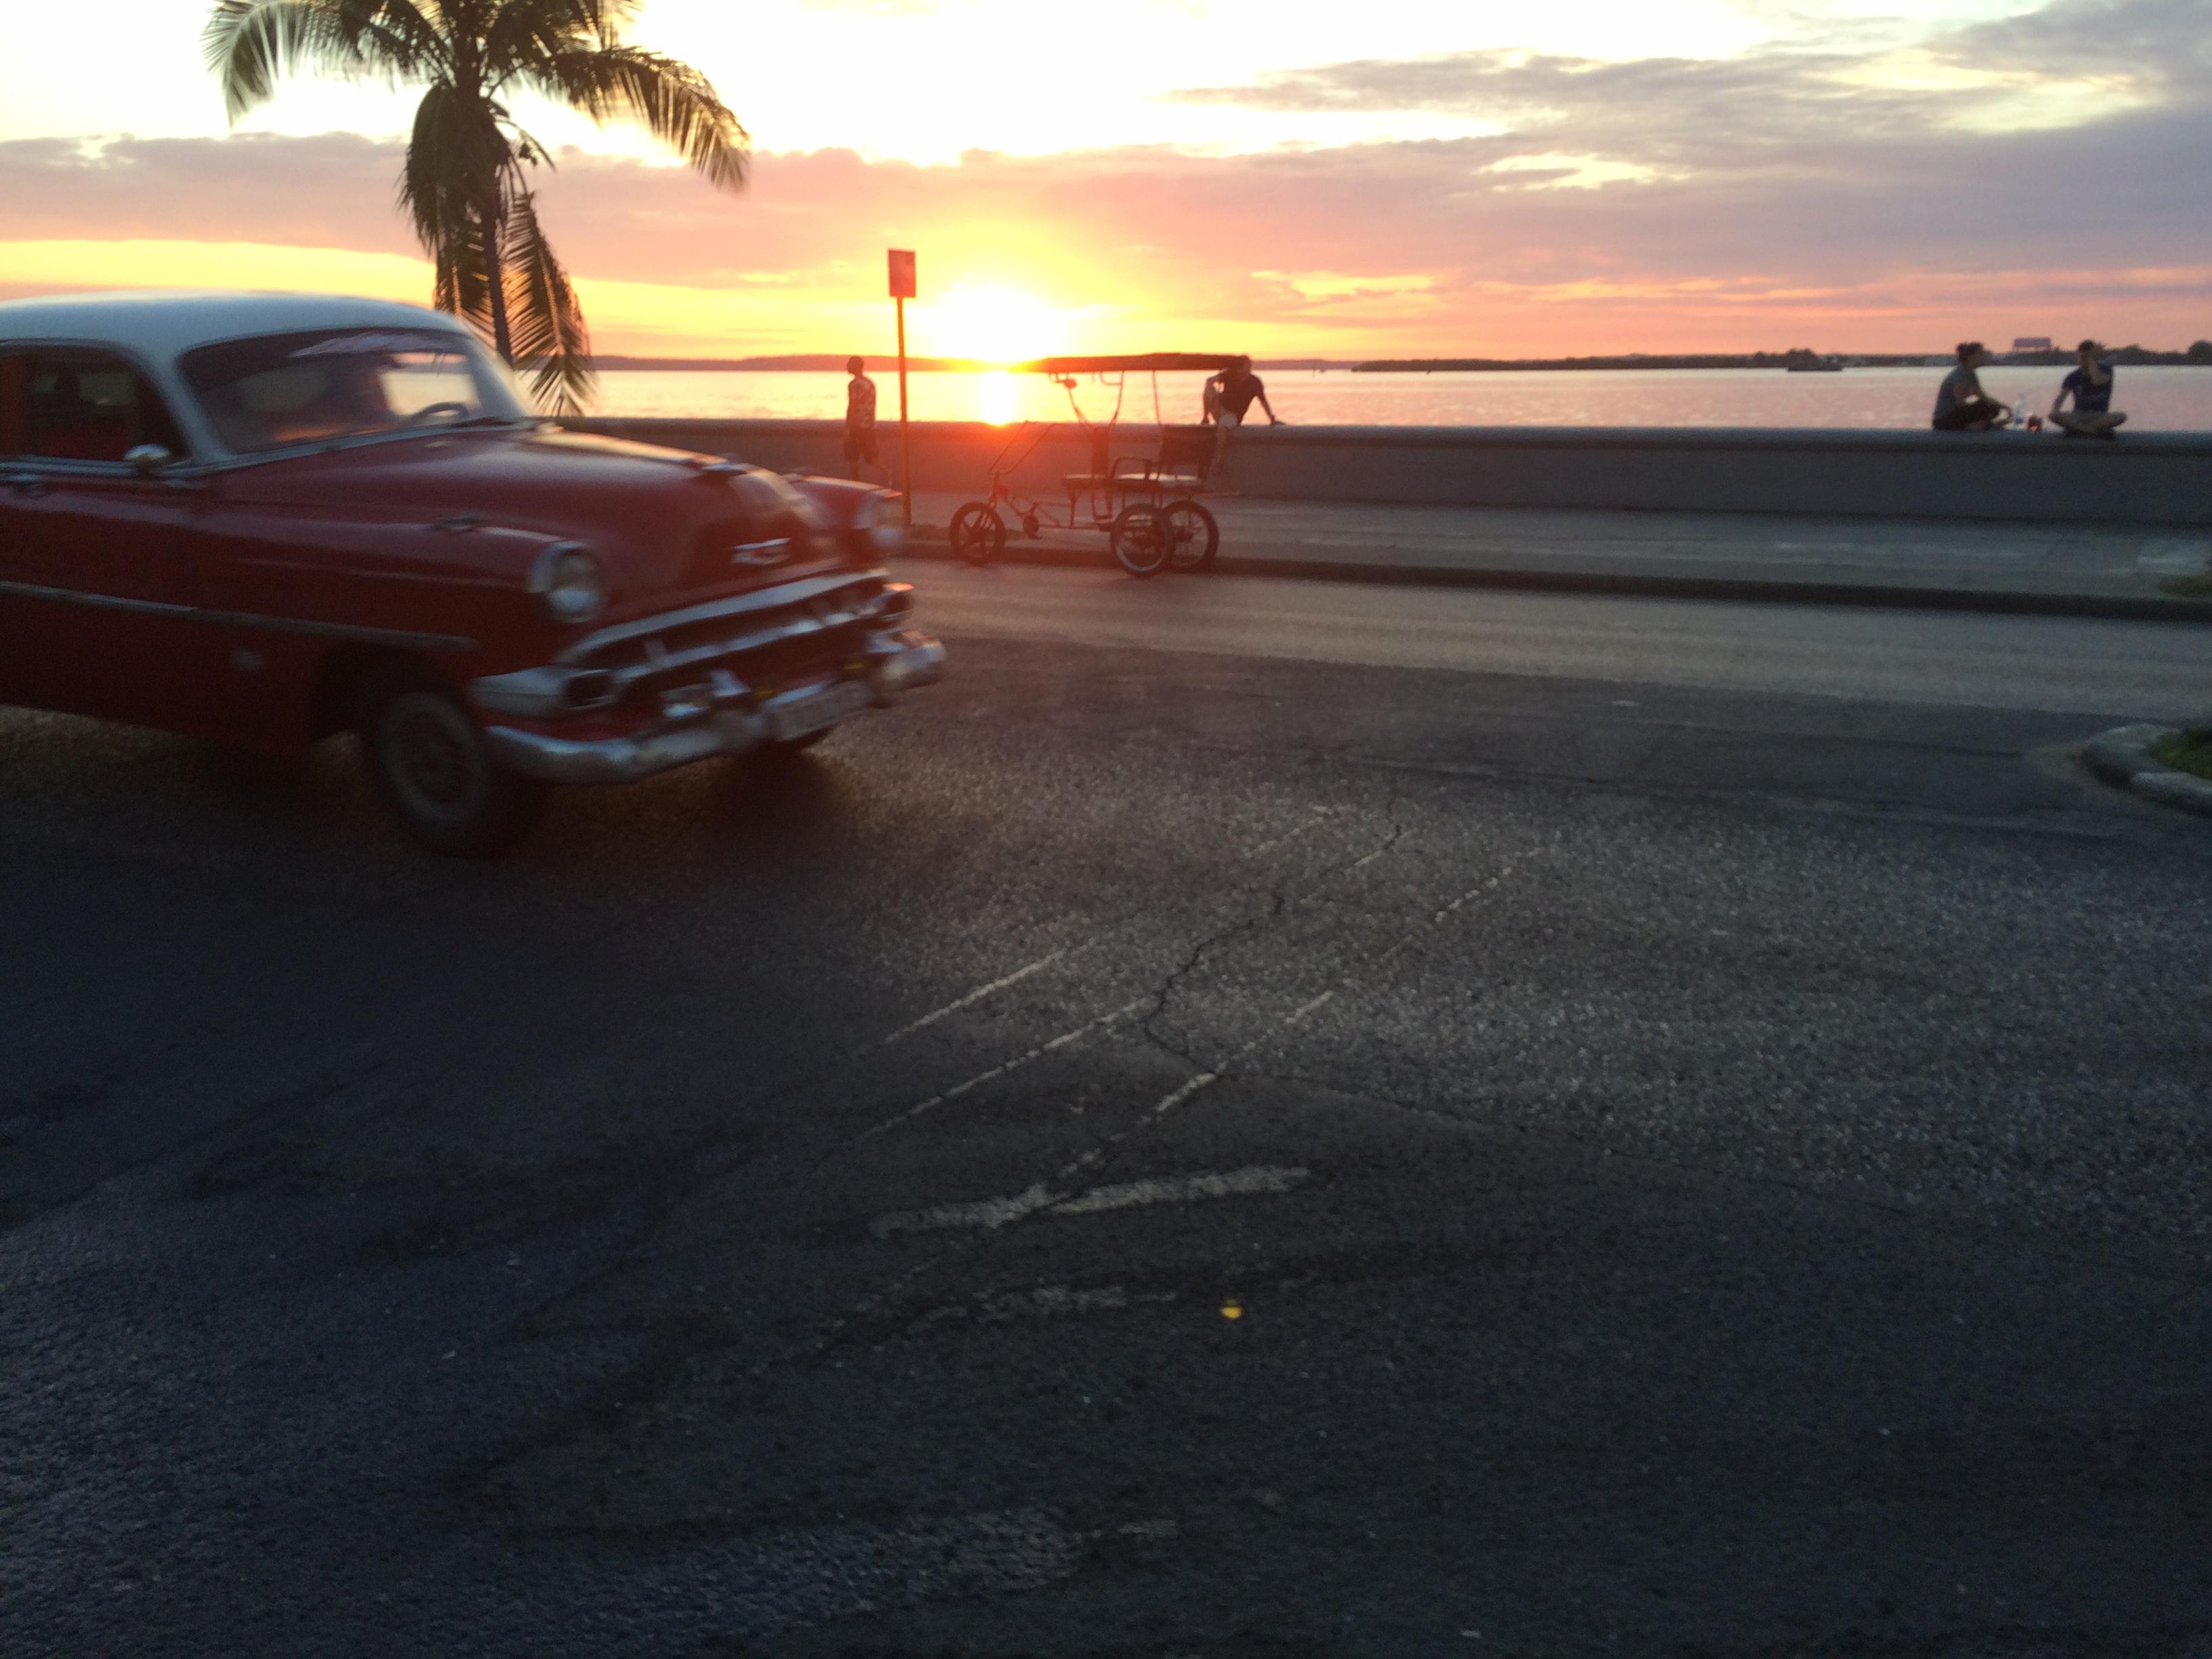 Kuba, Oldtimer, Strand